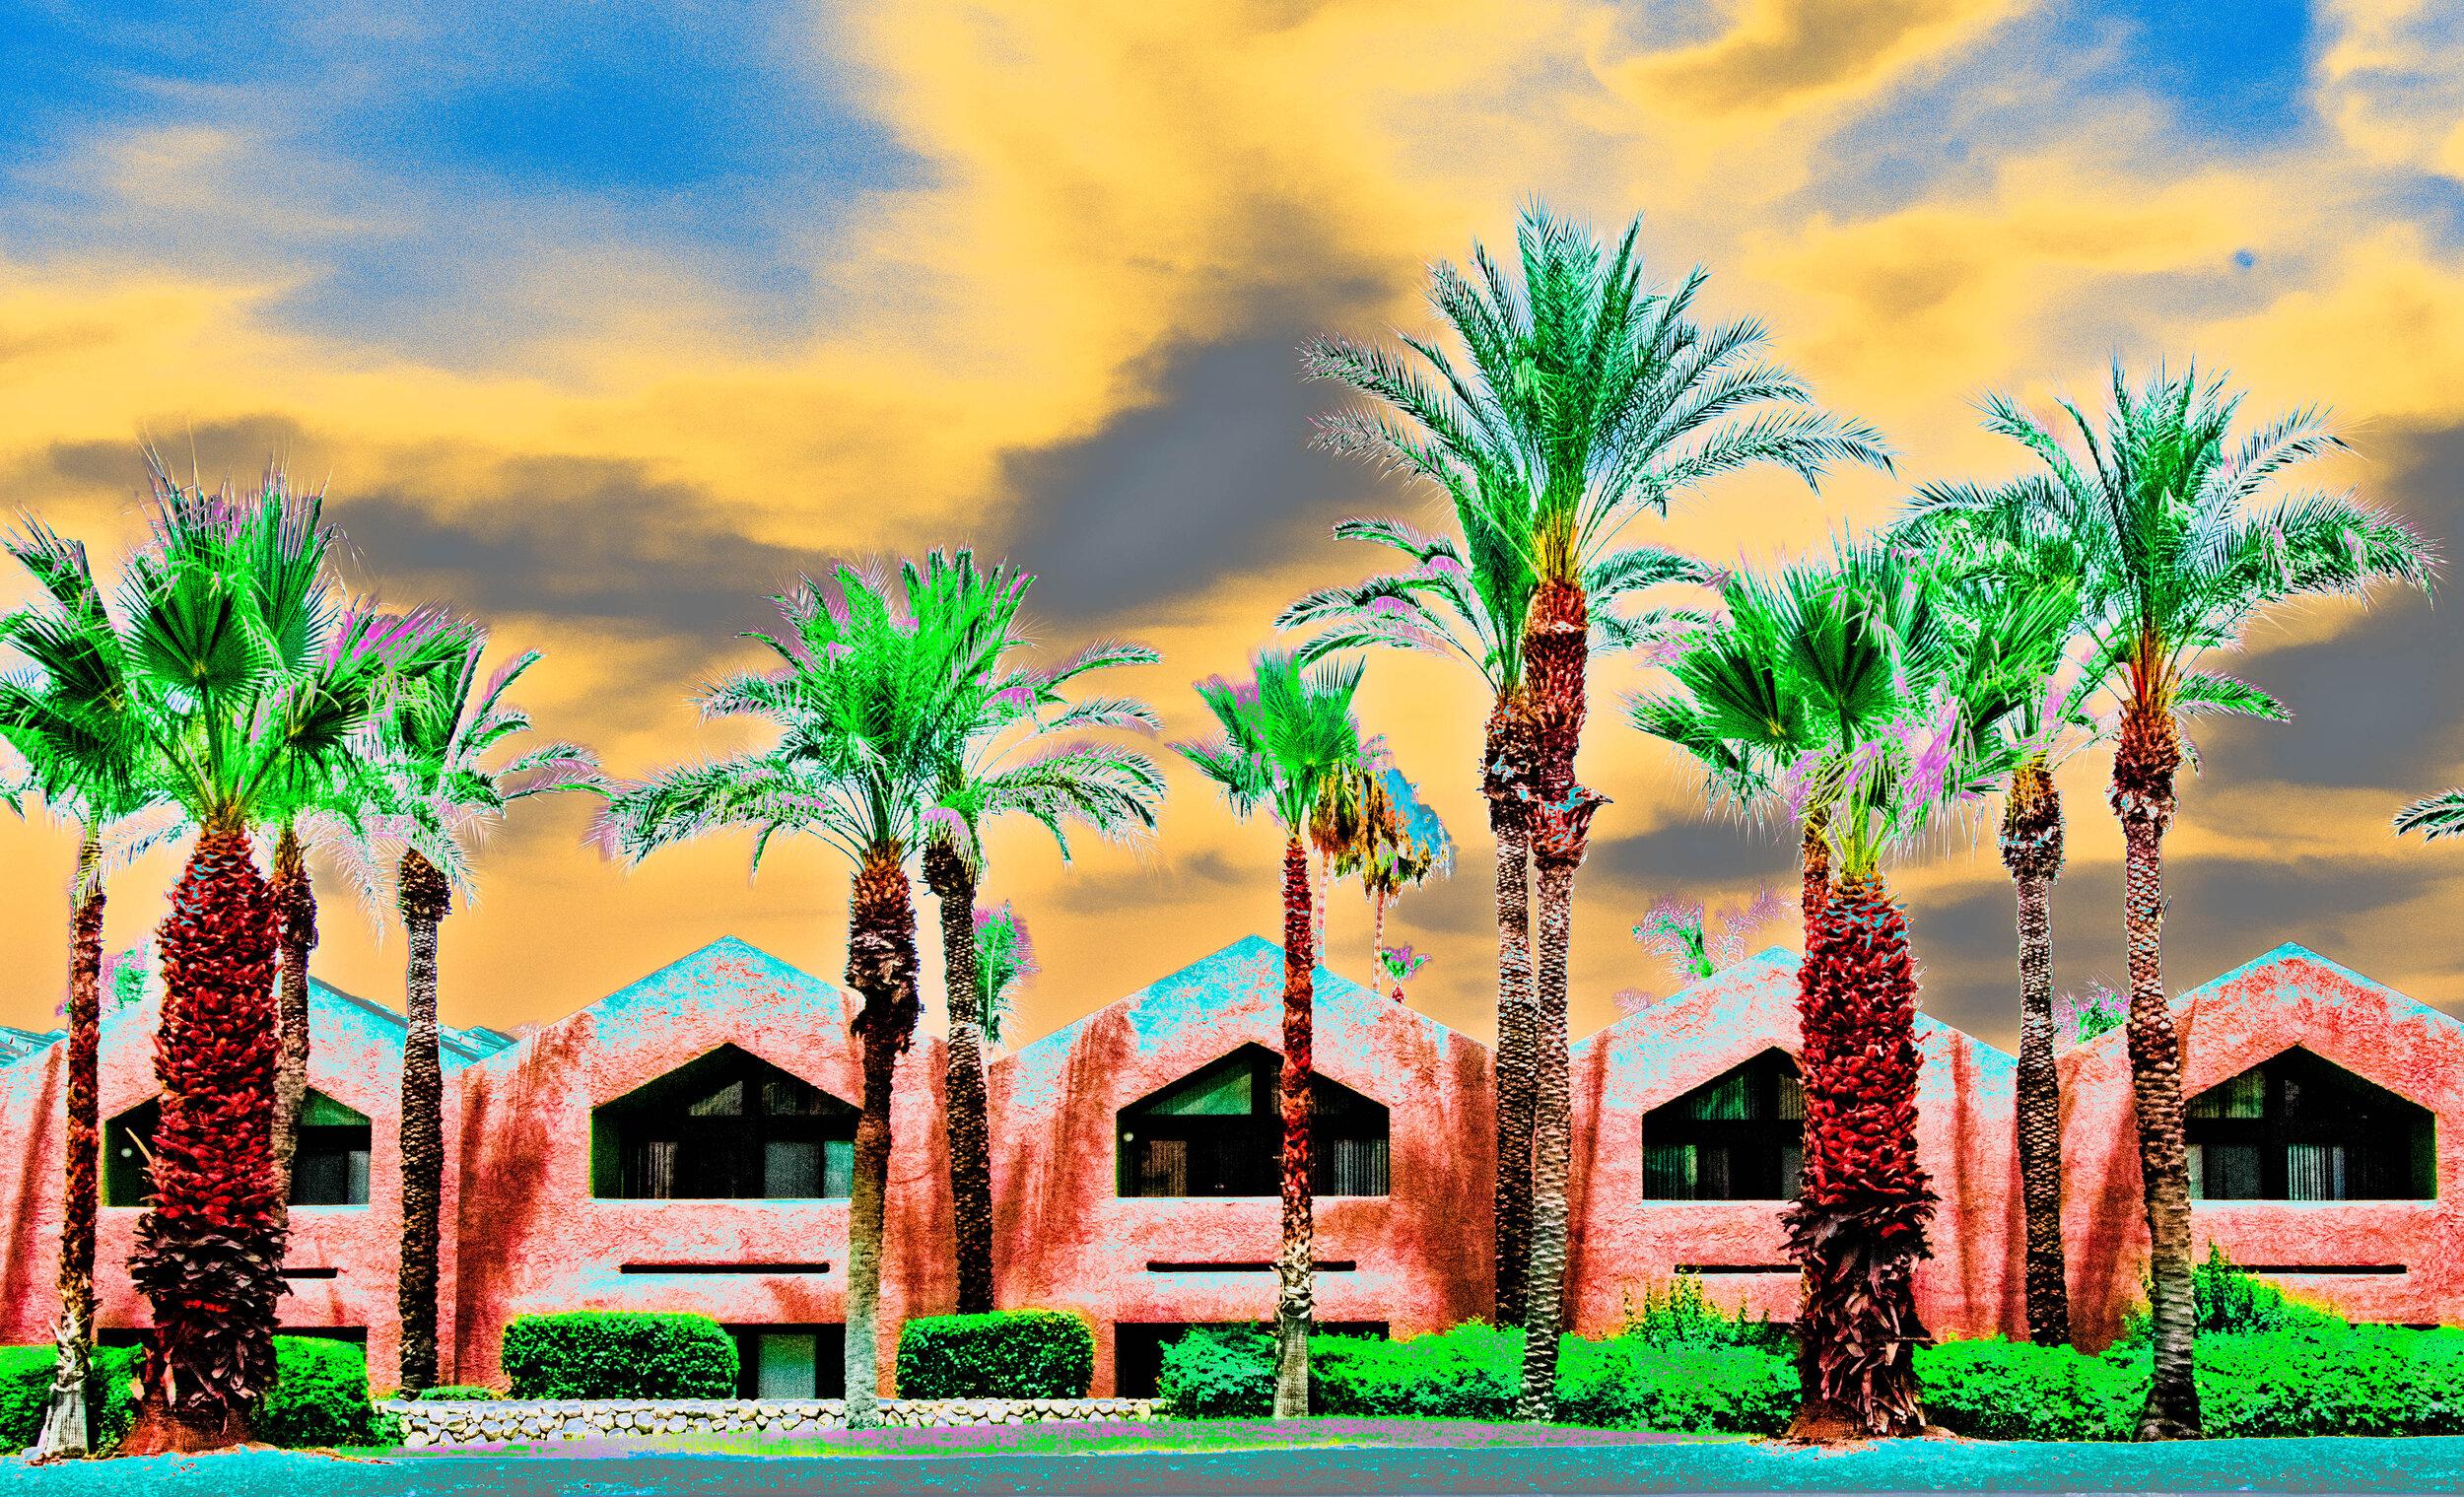 Palms and Peaks Palm Springs